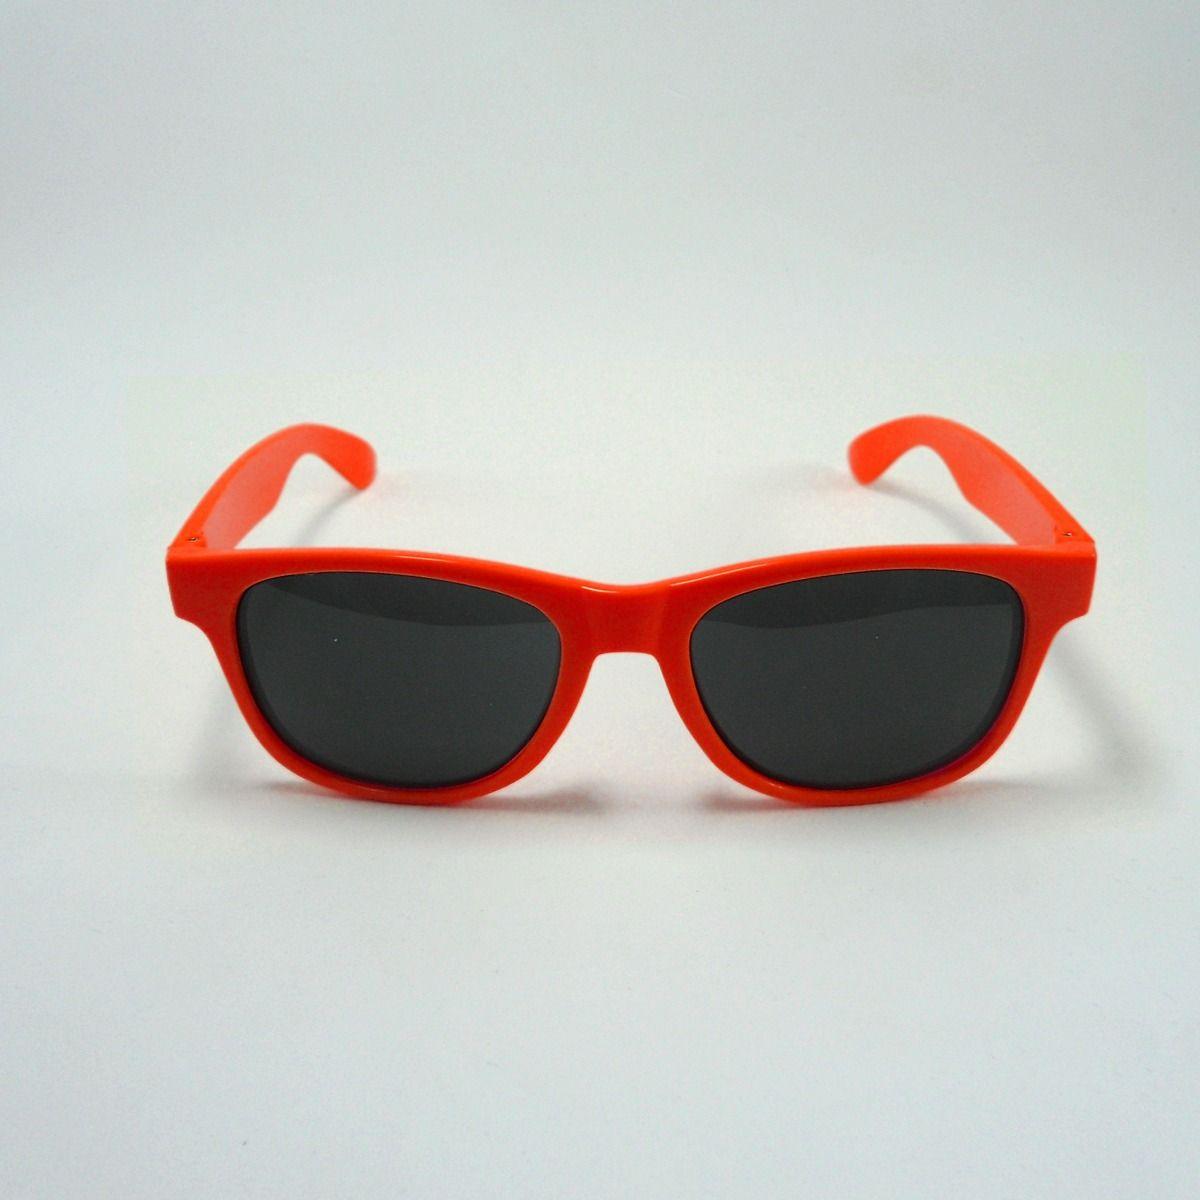 464c3df95 oculos ray lente fume adulto laranja fluorescente | Outros ...